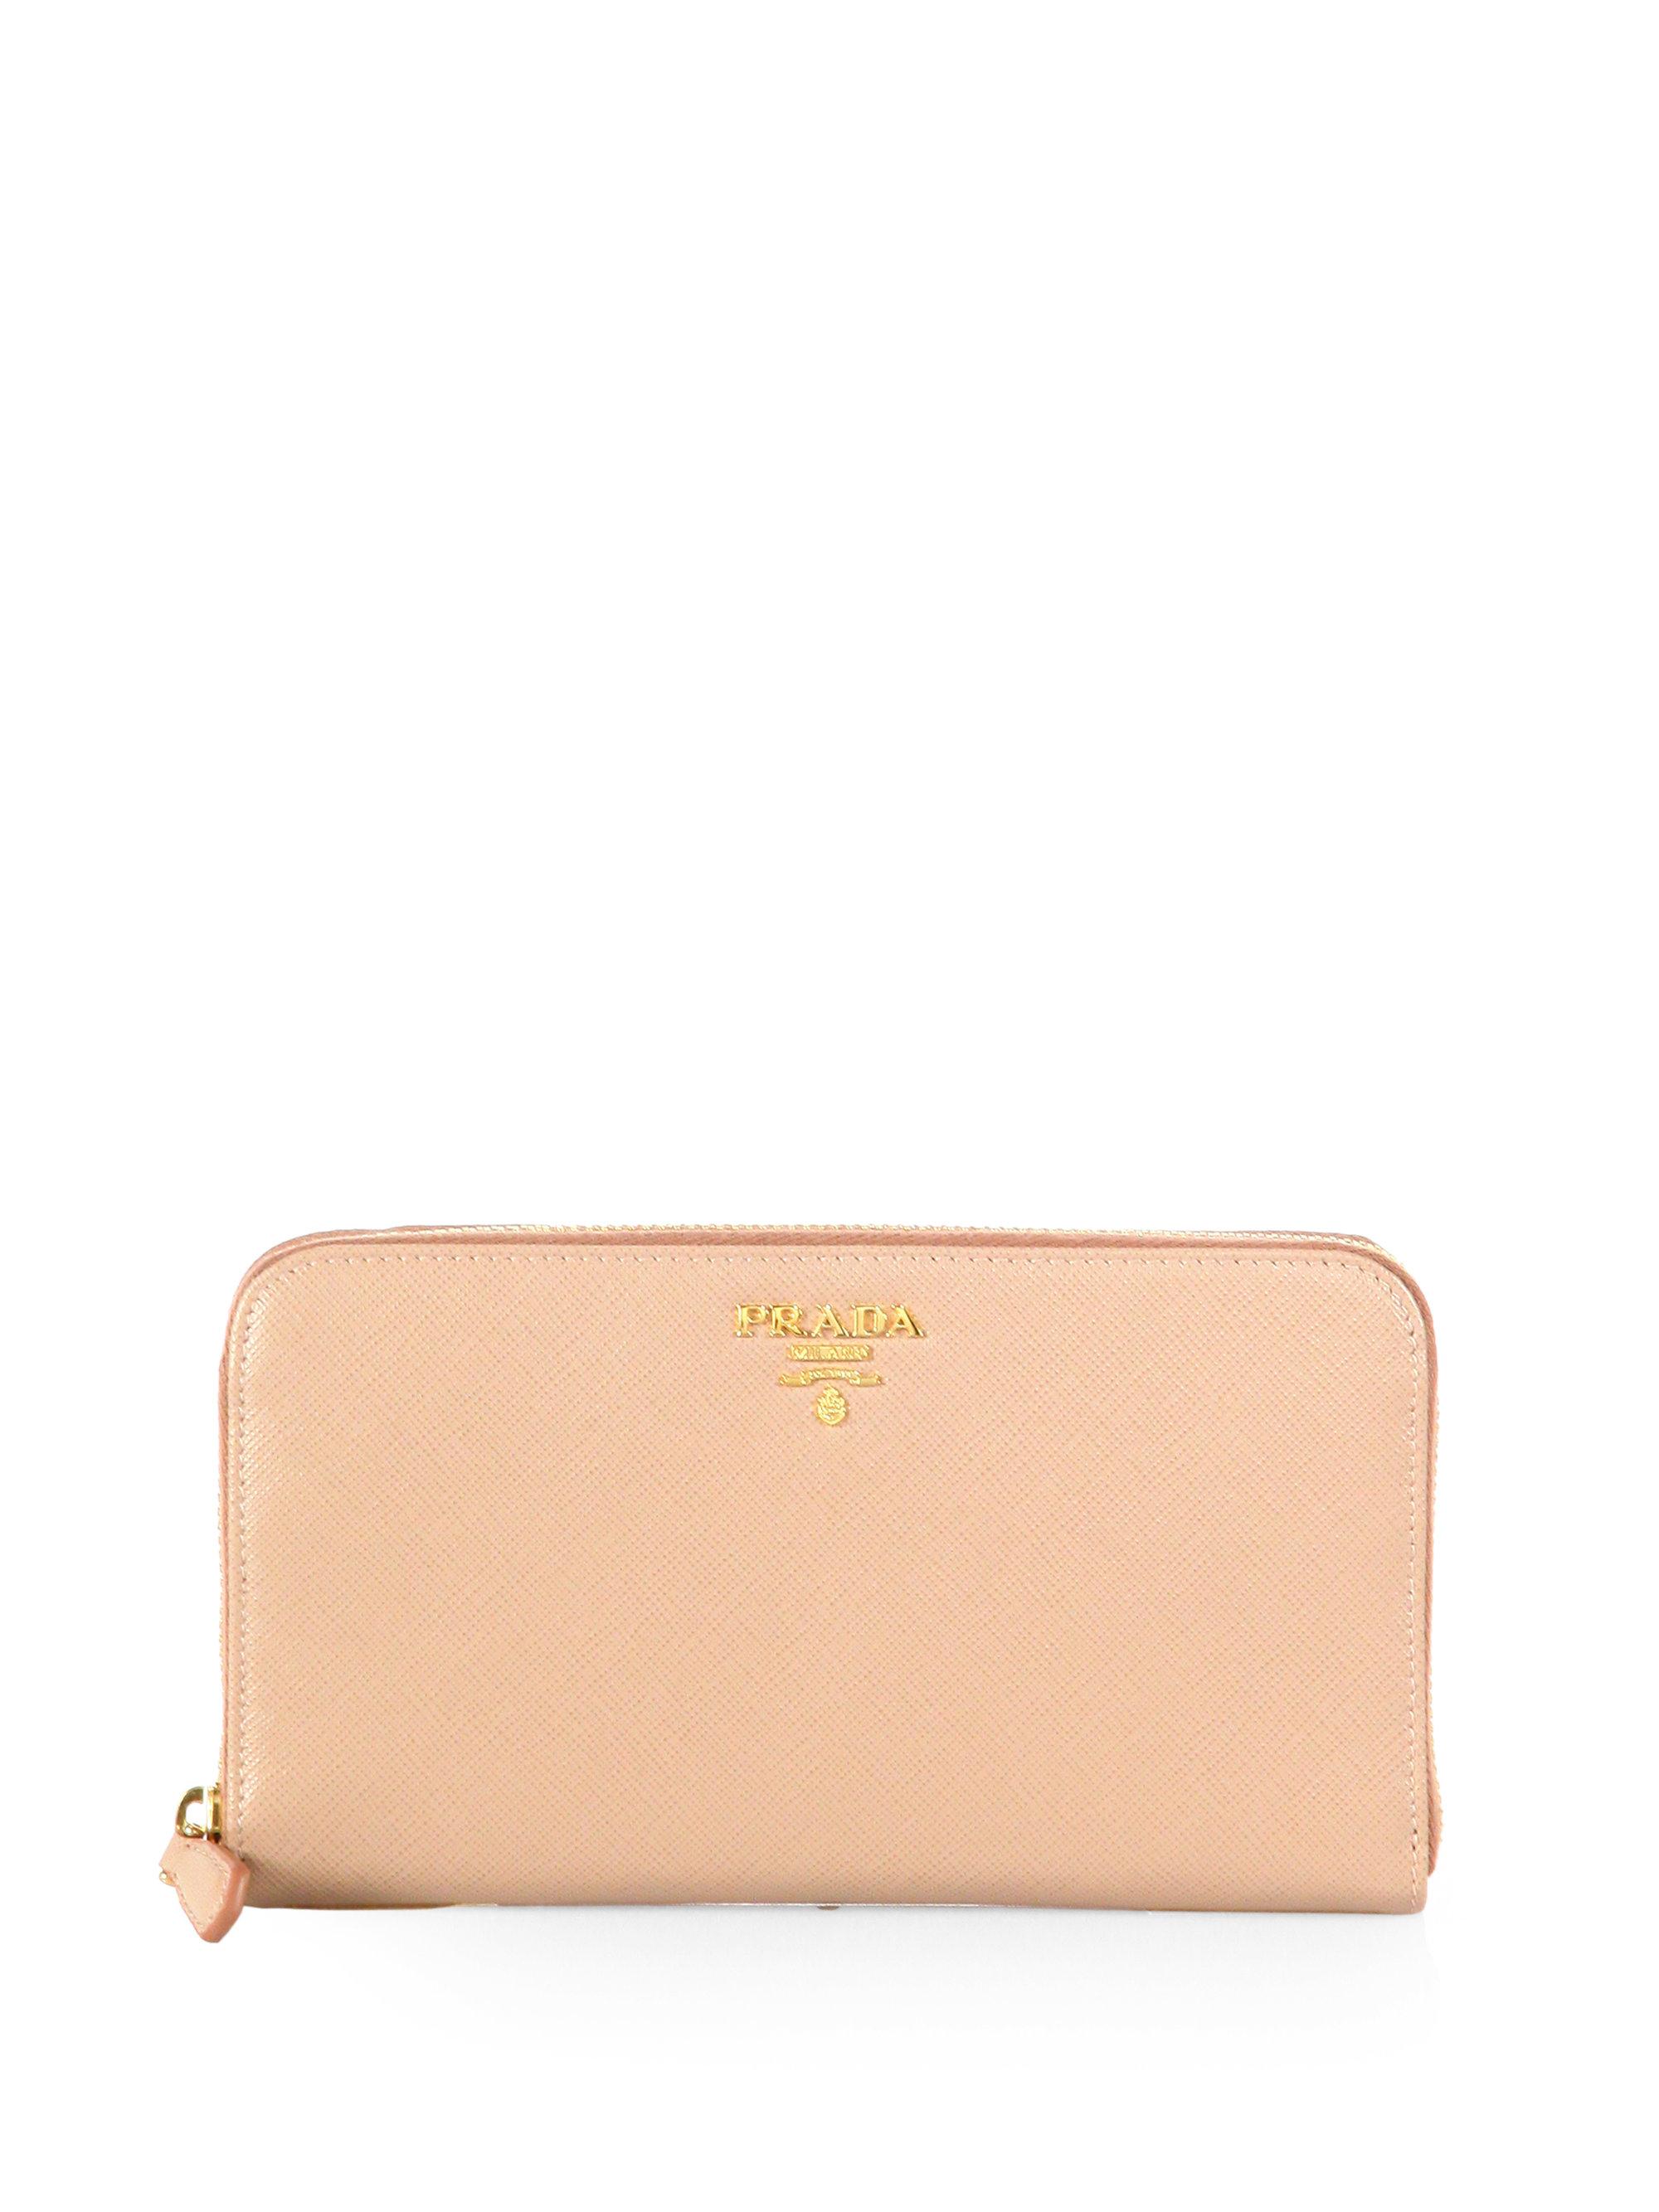 657cda1dea57 ... cheap lyst prada saffiano metal oro continental wallet in pink 18cc3  e0d16